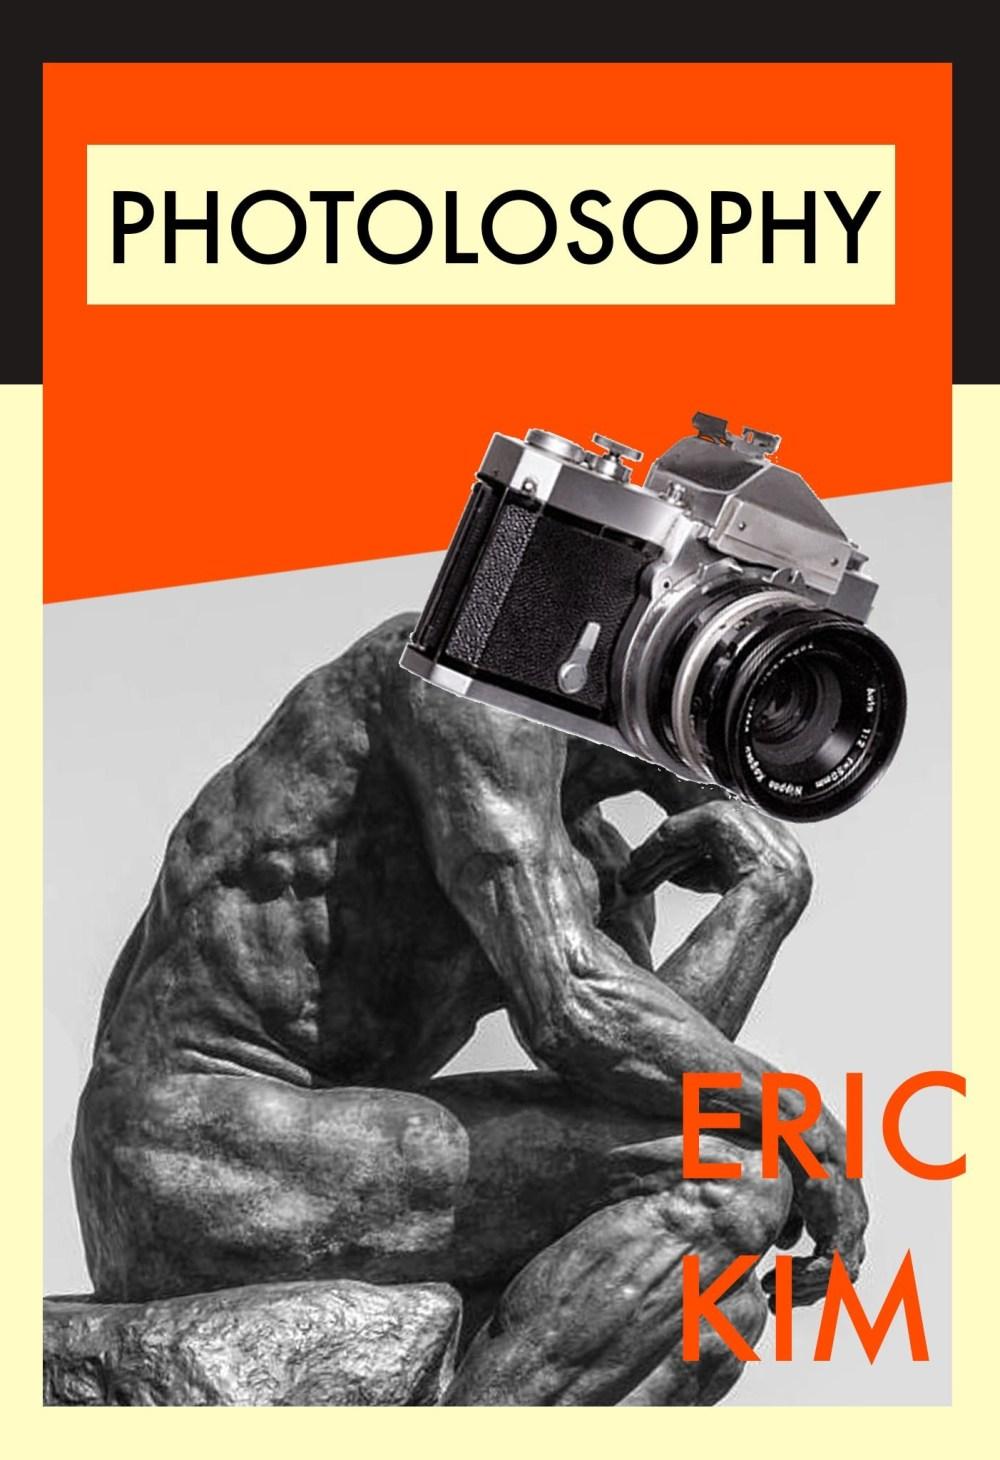 Photolosophy